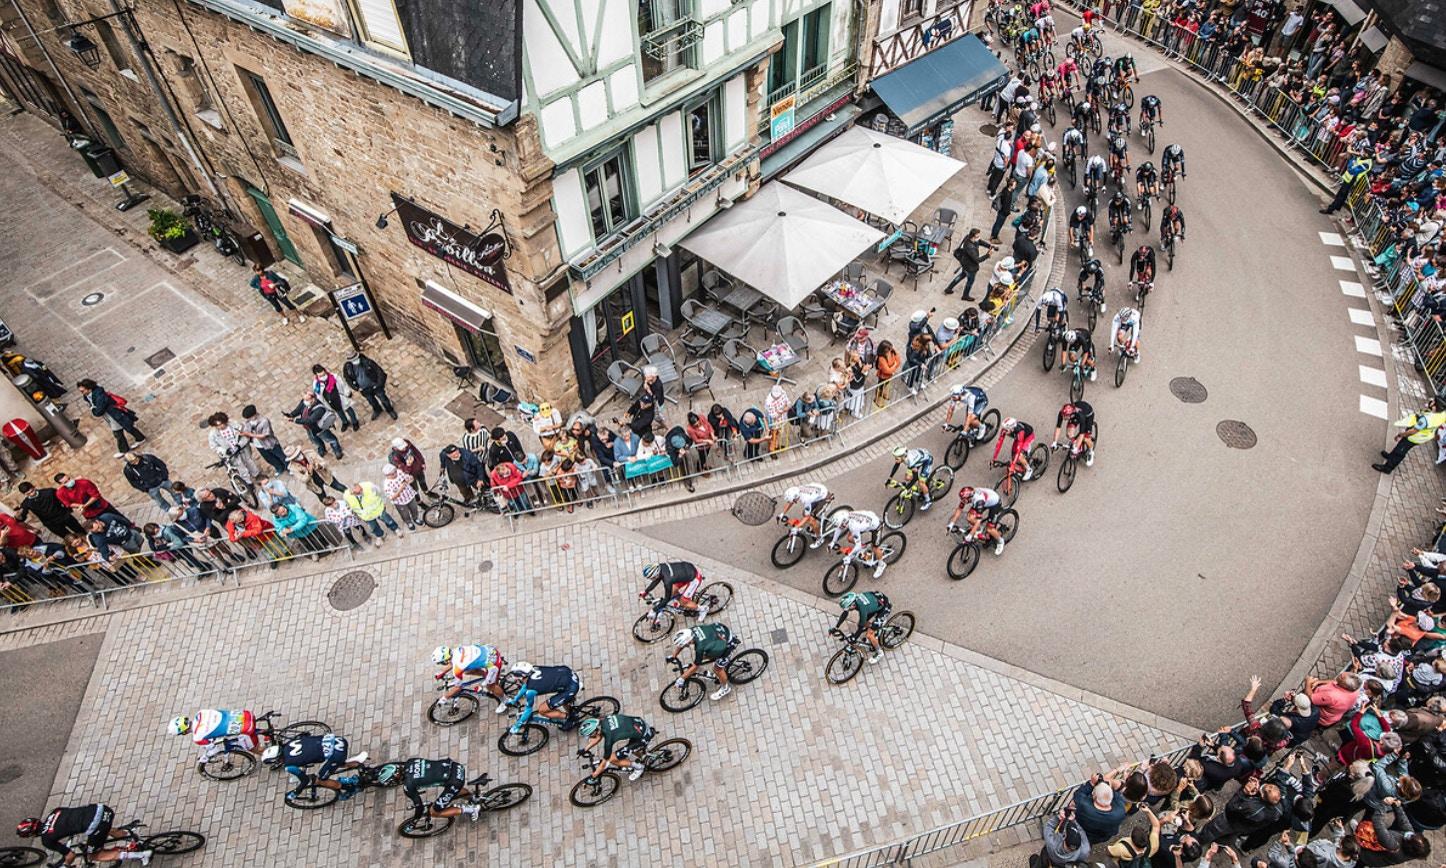 Tour de France 2021: Zusammenfassung der dritten Etappe